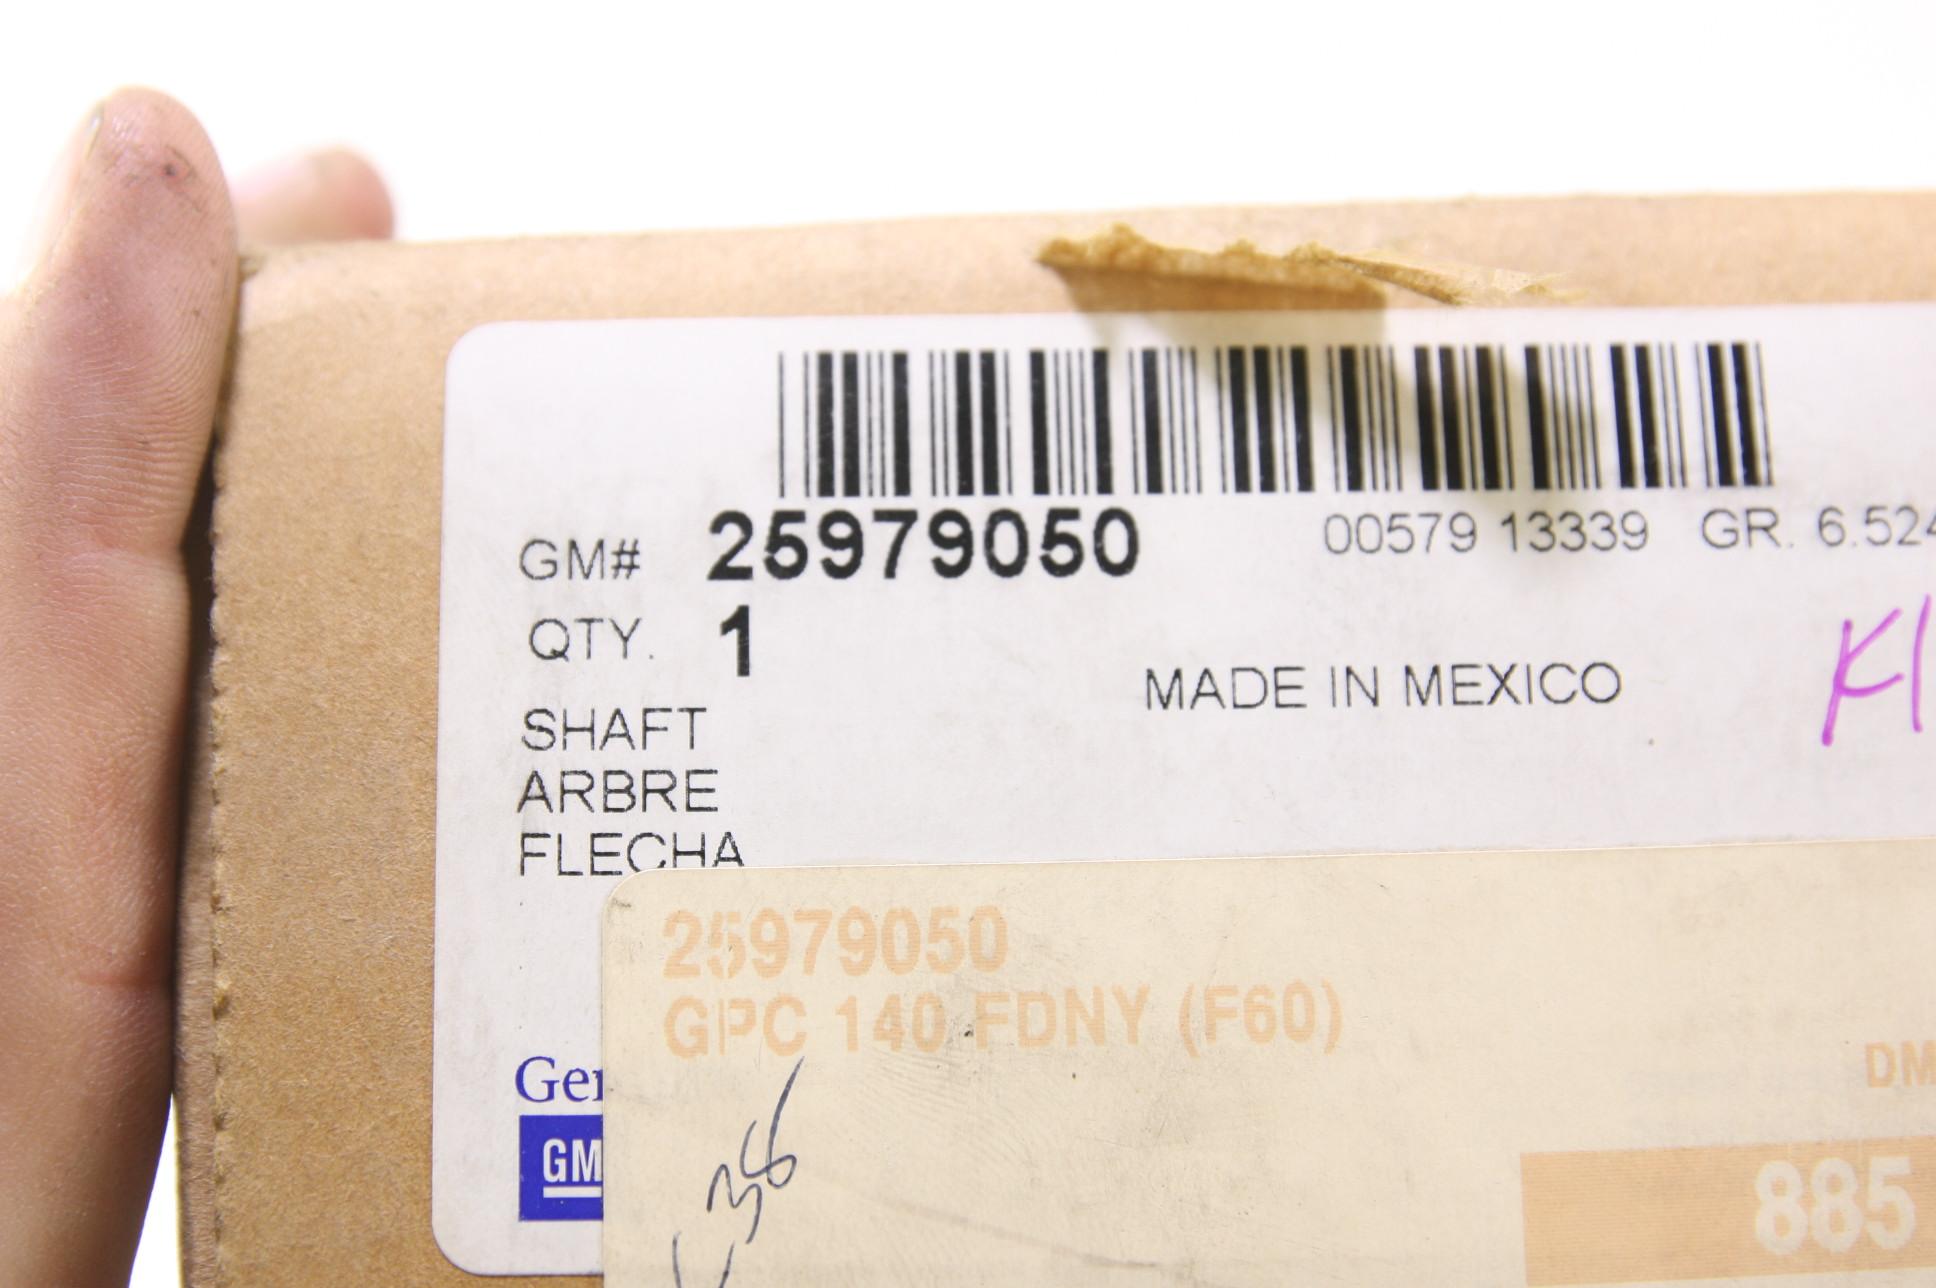 New OEM 25979050 GM Steering Column Lower Shaft Fast Free Shipping NIP - image 3